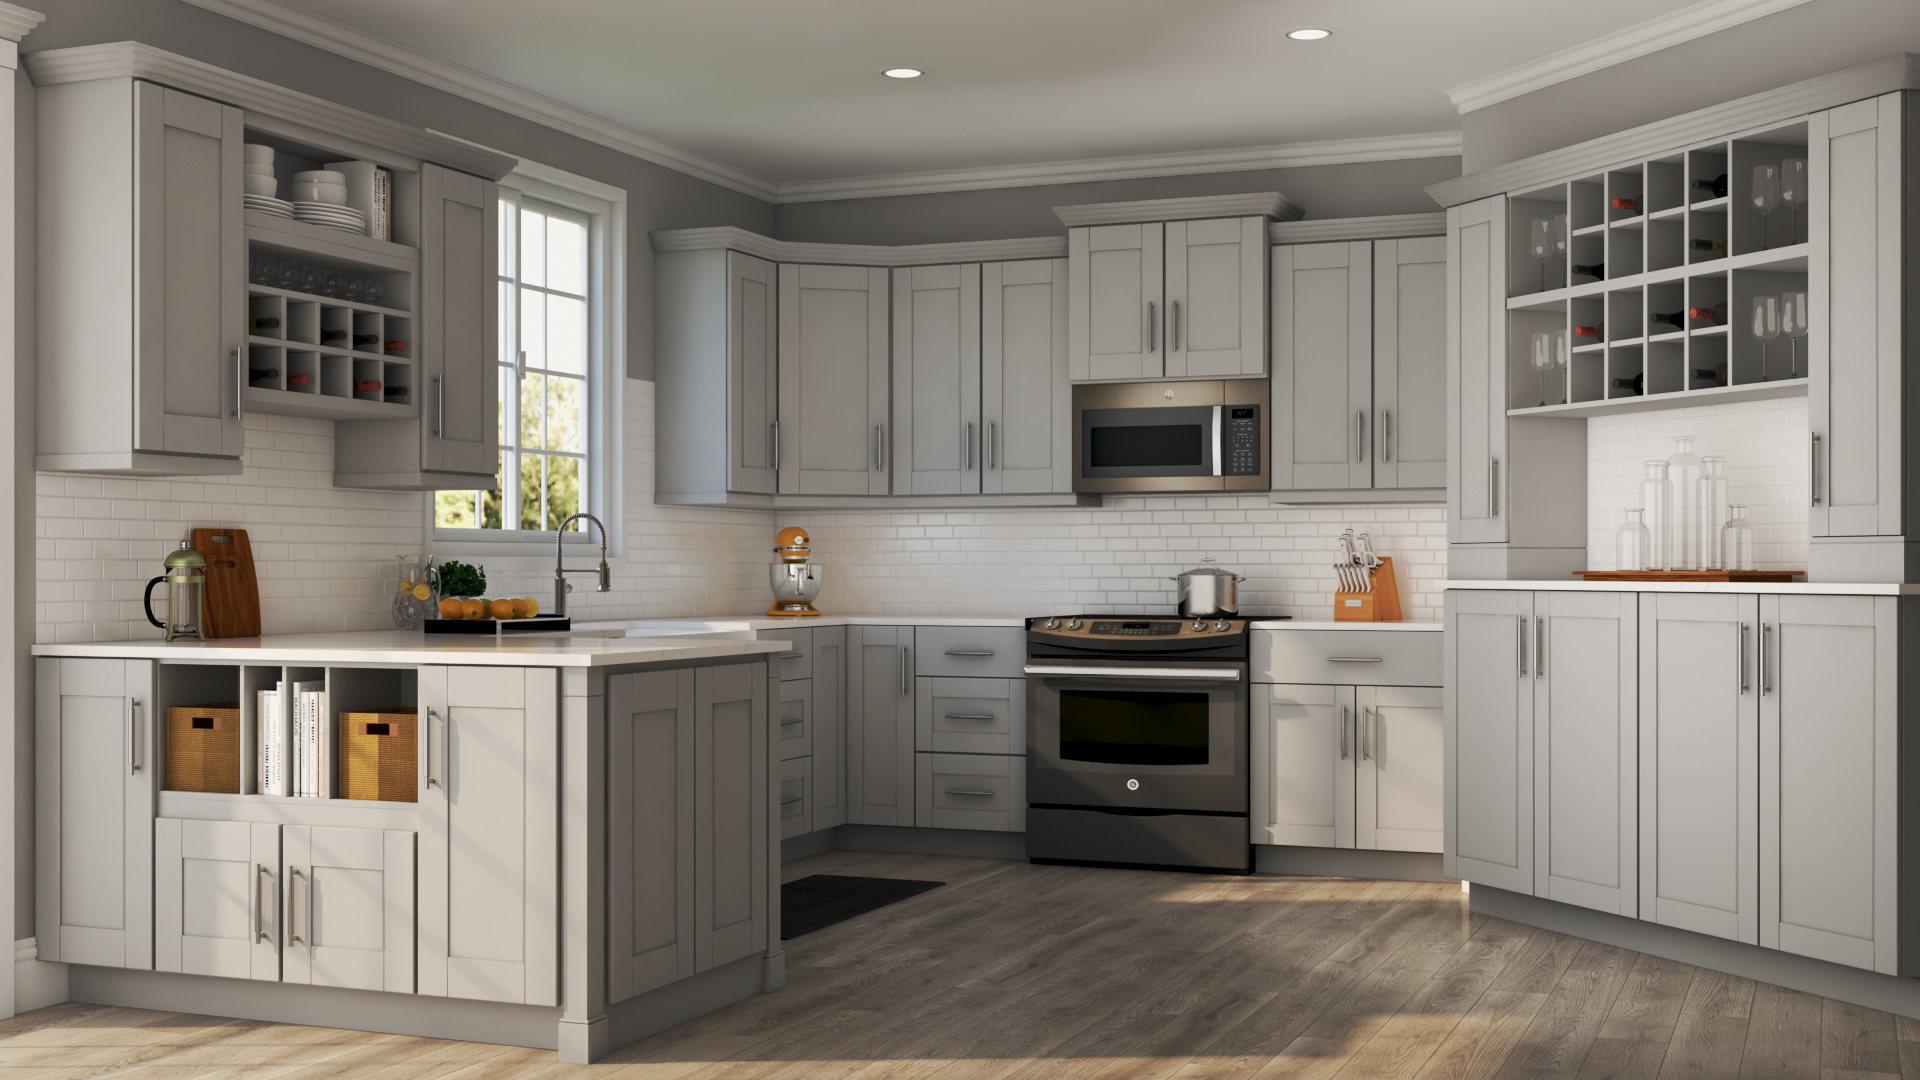 Kitchen Design Gray Cabinets  Kitchens Design Ideas And